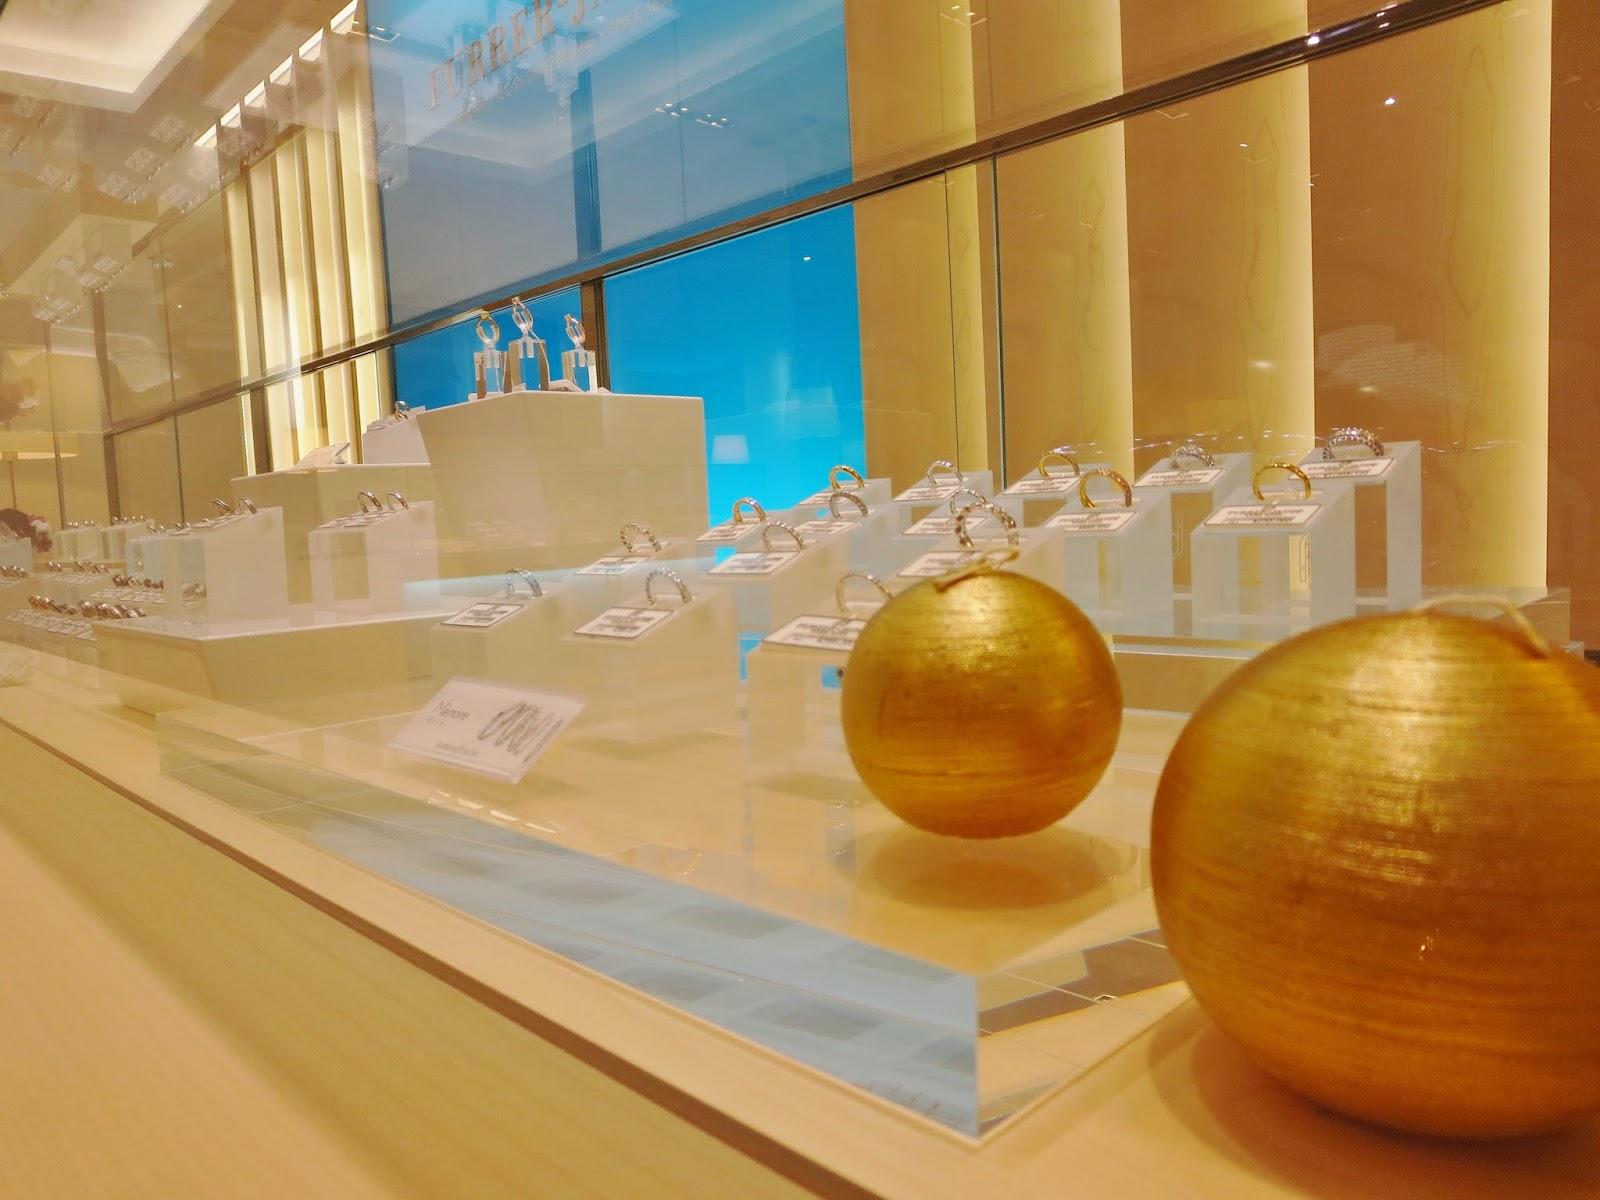 FURRER JACOT gallery NAGOYA  ウエーヴ ダイヤモンド FURRER JACOT フラージャコー 名古屋 栄 結婚指輪 ゴールド 鍛造